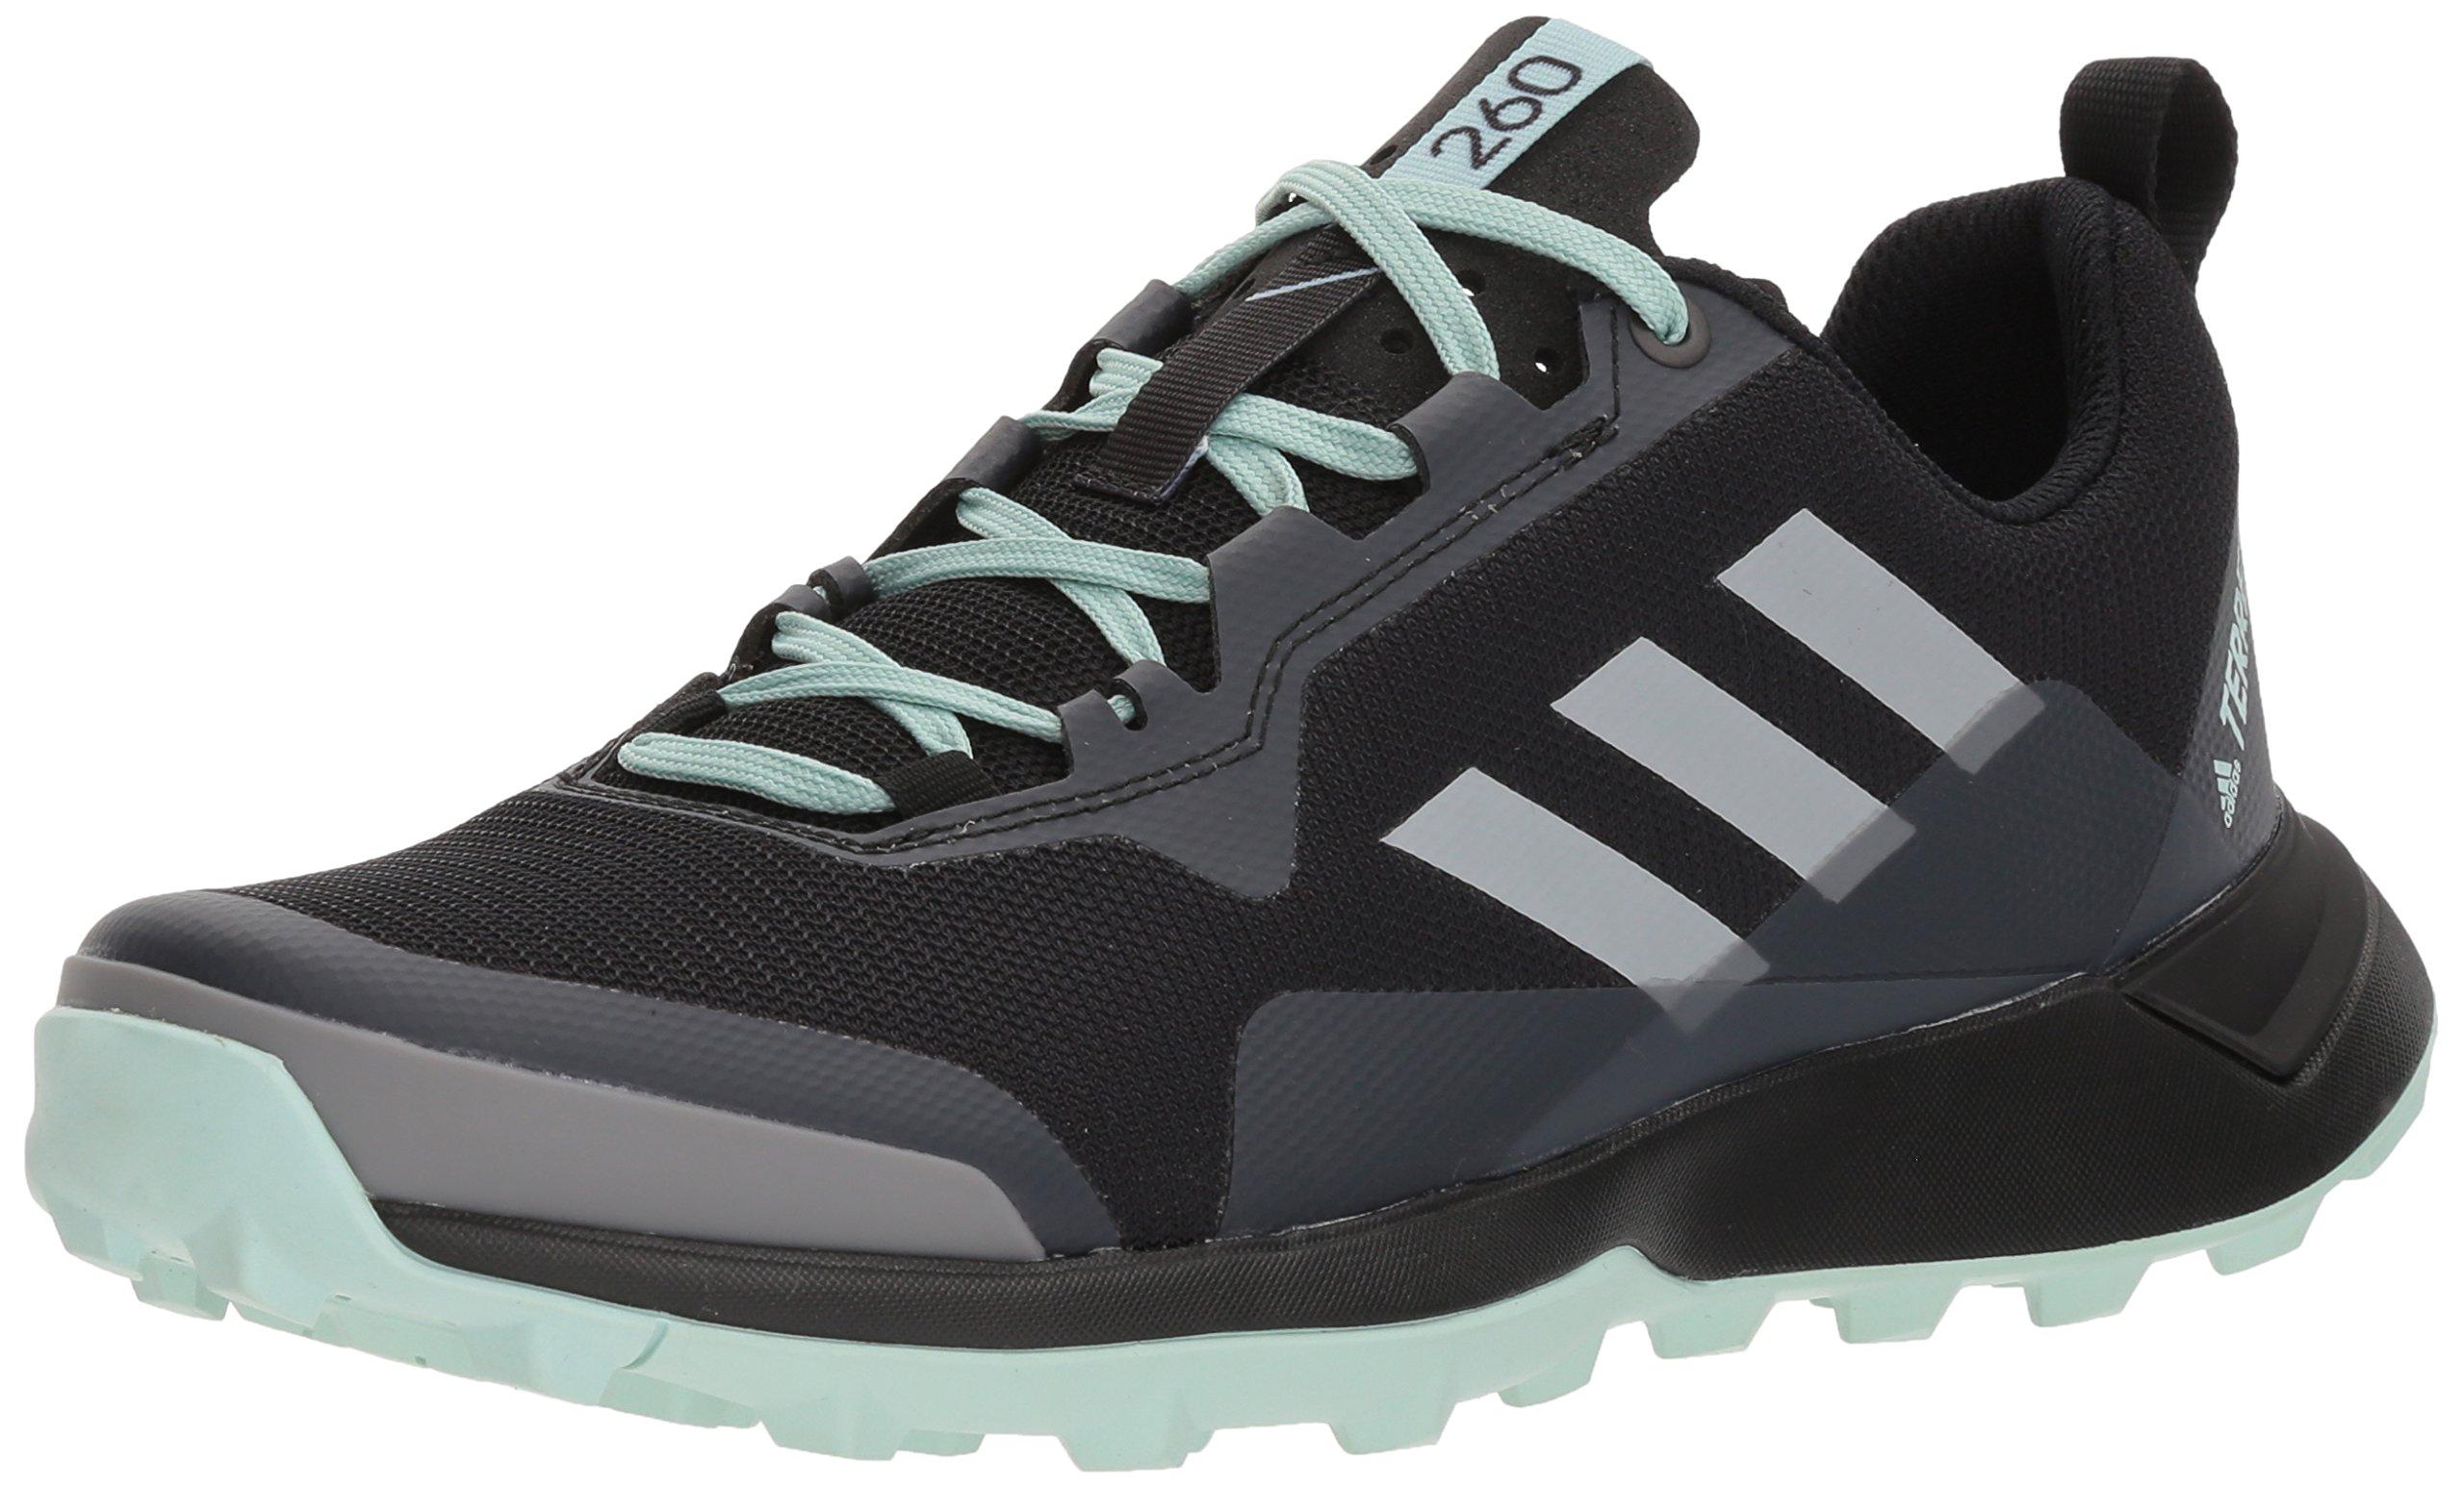 adidas outdoor Women's Terrex CMTK W Walking Shoe, Black/Chalk White/ash Green, 8.5 M US by adidas outdoor